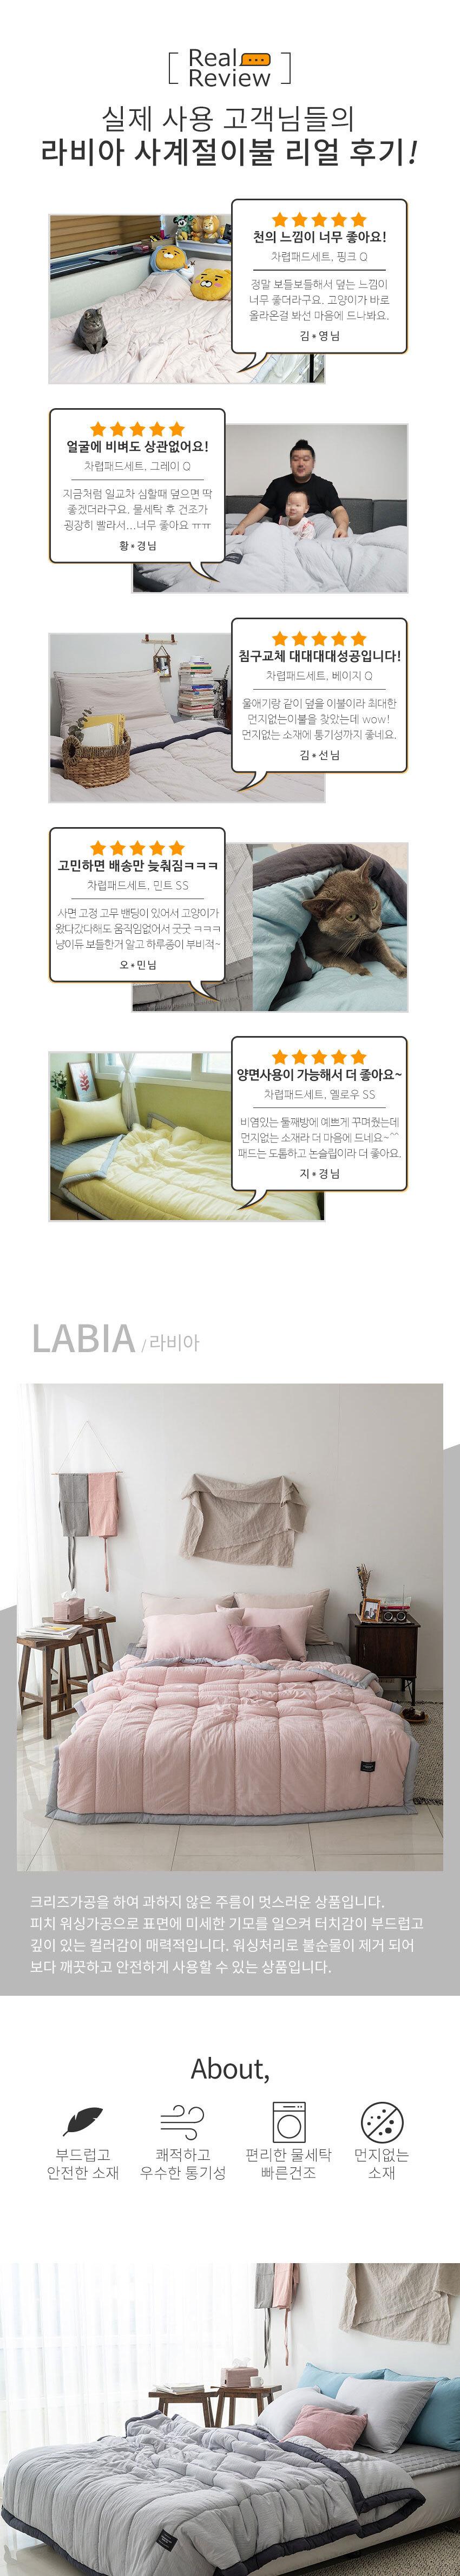 labia_bed_top.jpg